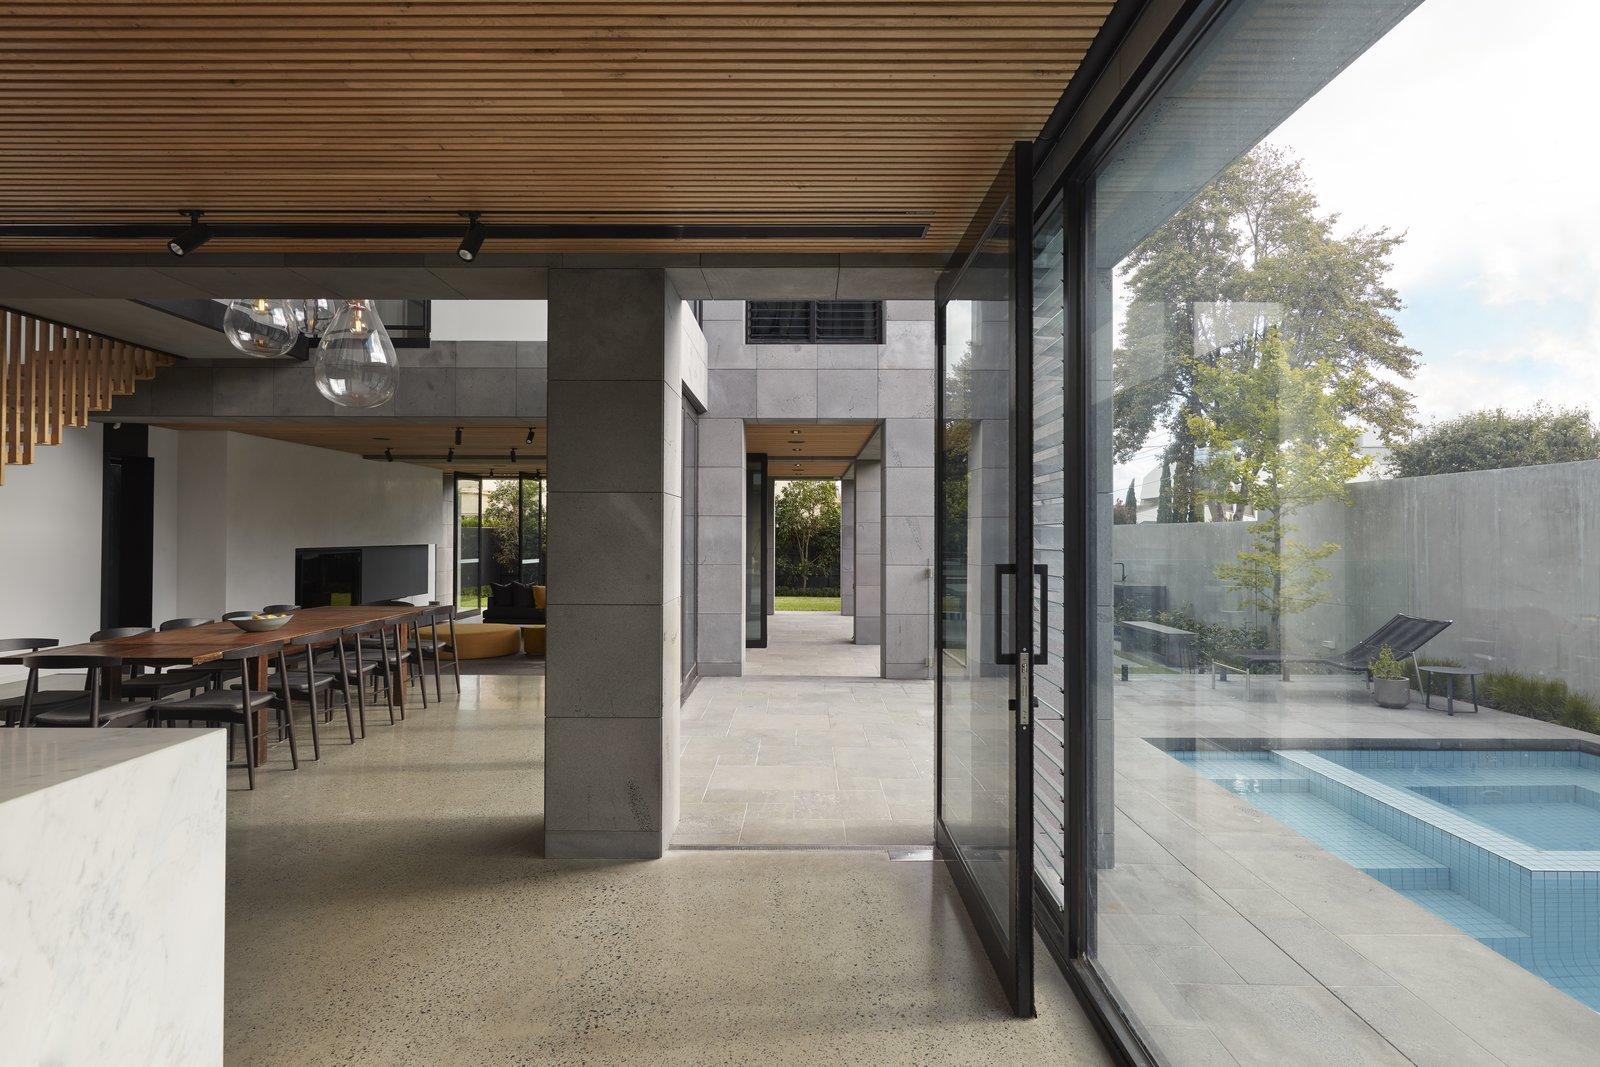 Textured Bluestone Marries Minimalist Design in This Timeless Abode